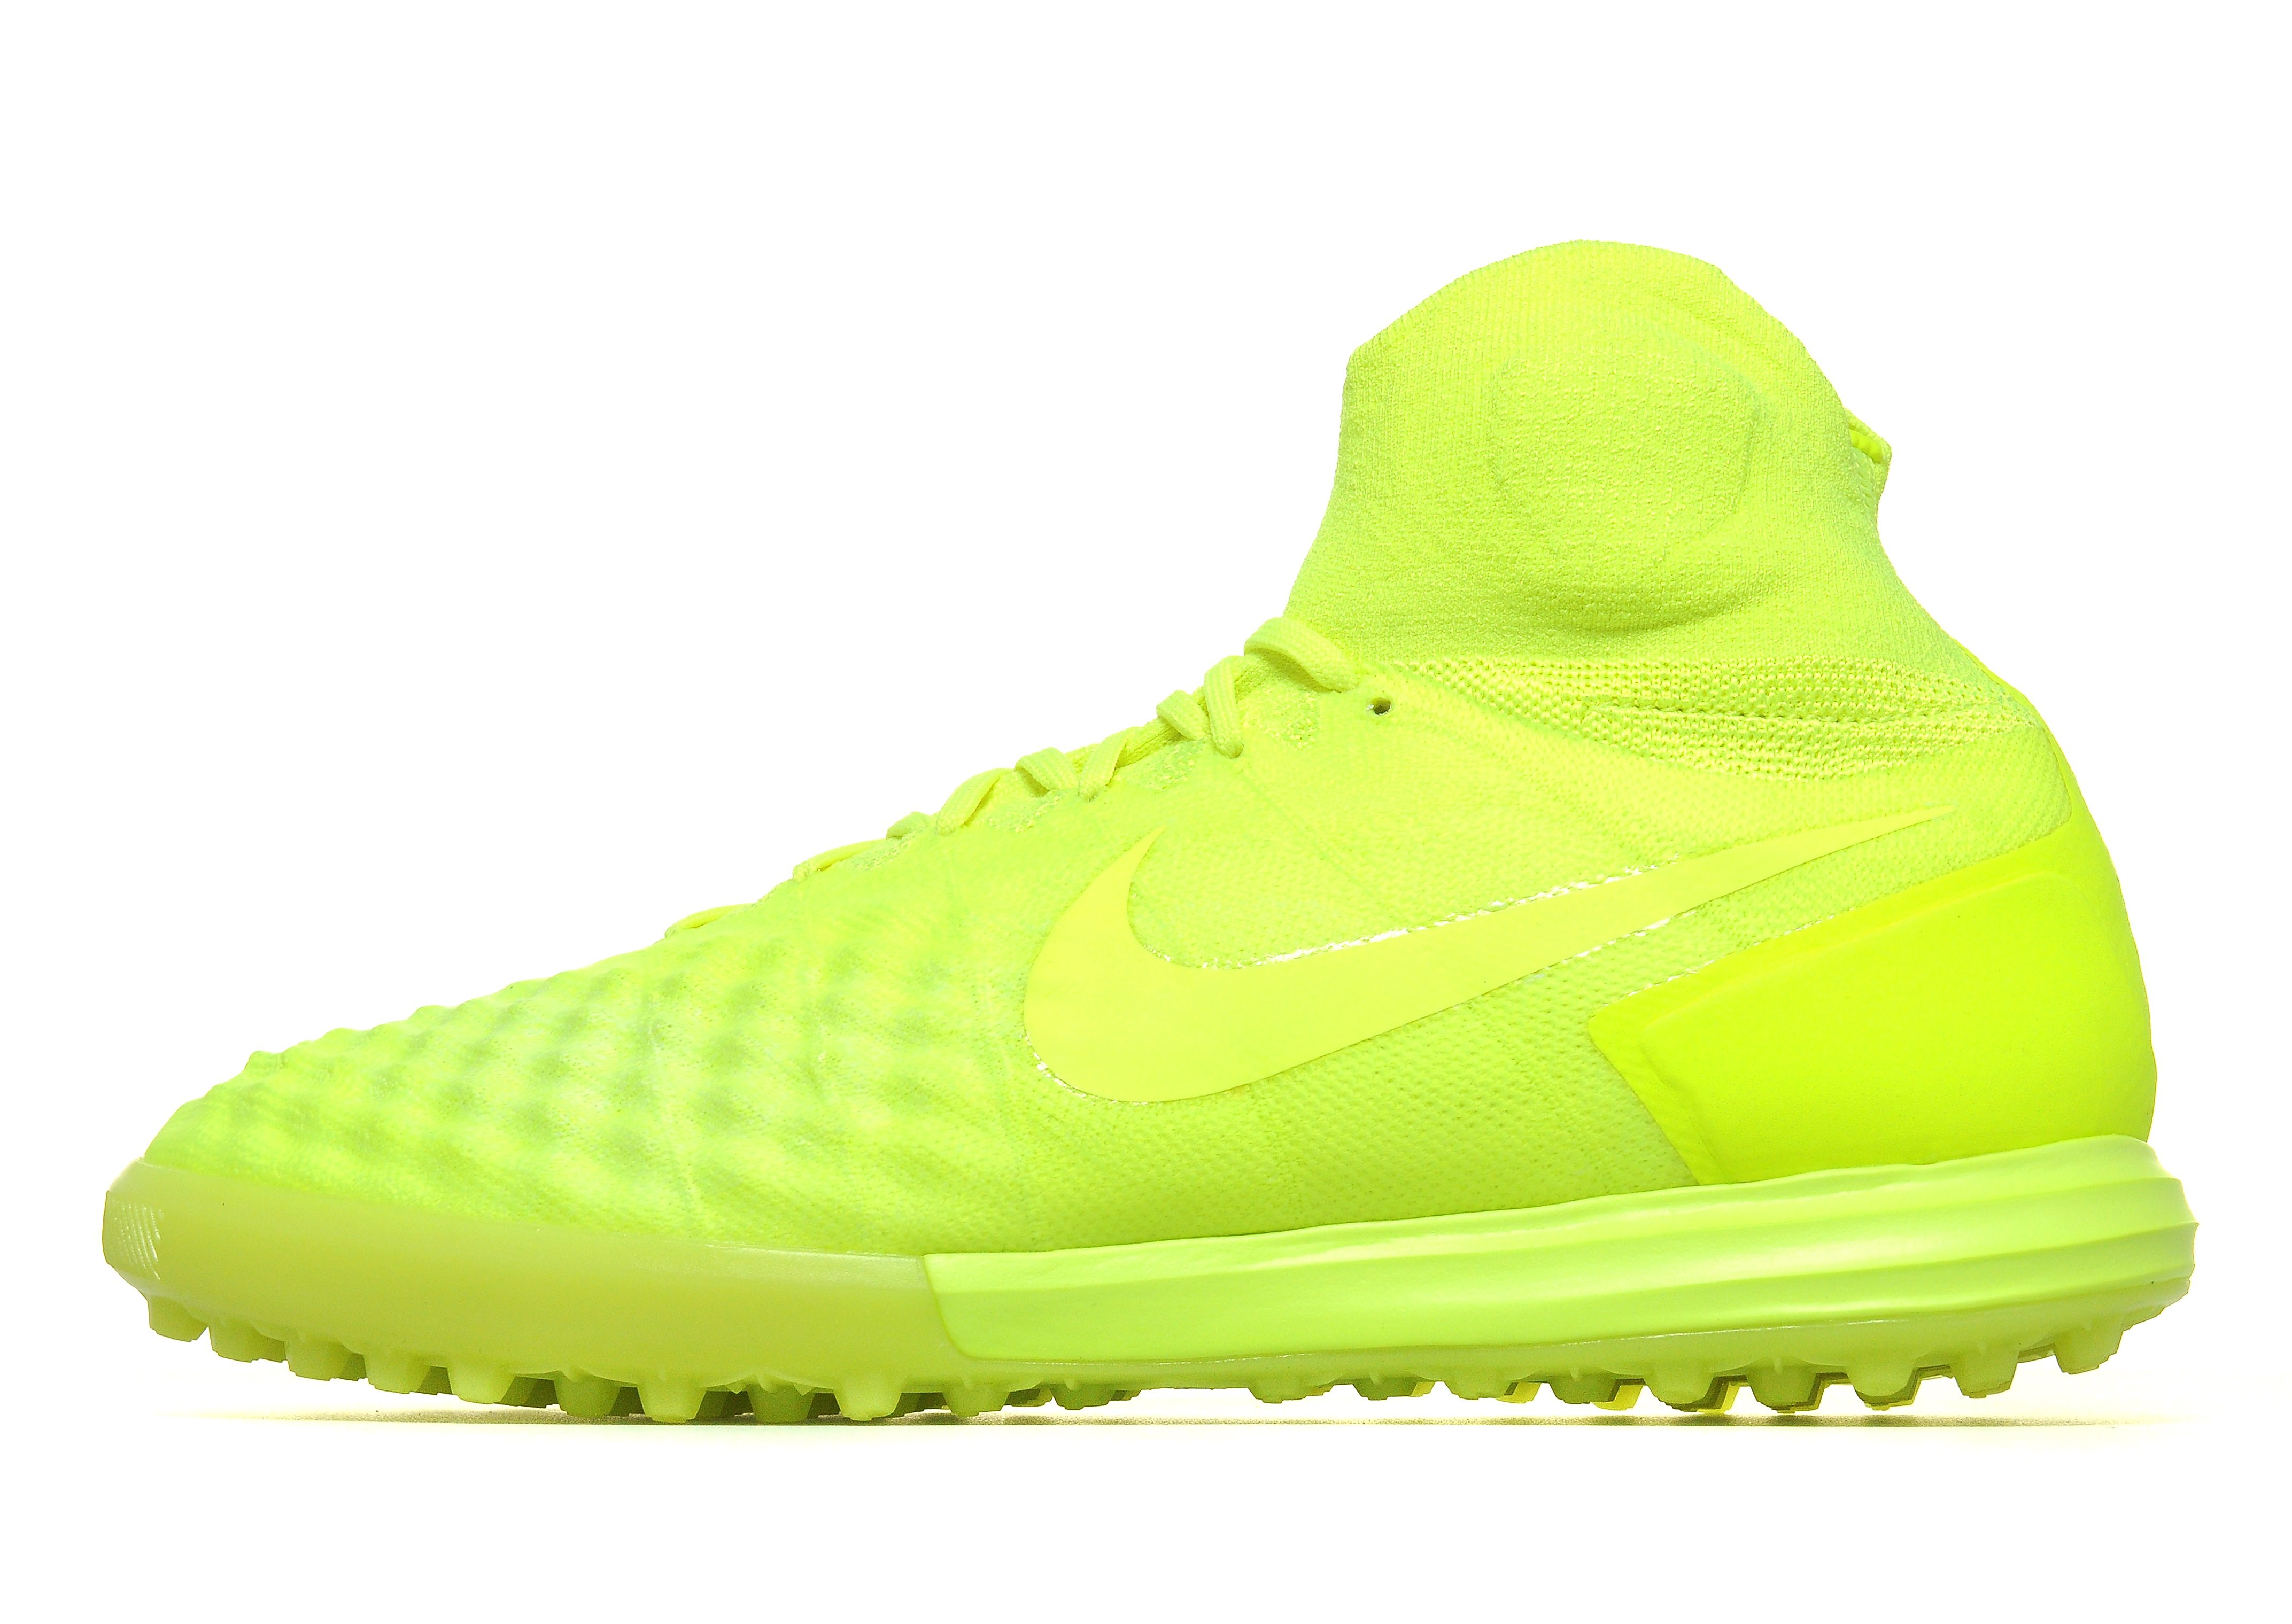 Nike Football X Glow MagistaX Proximo Turf